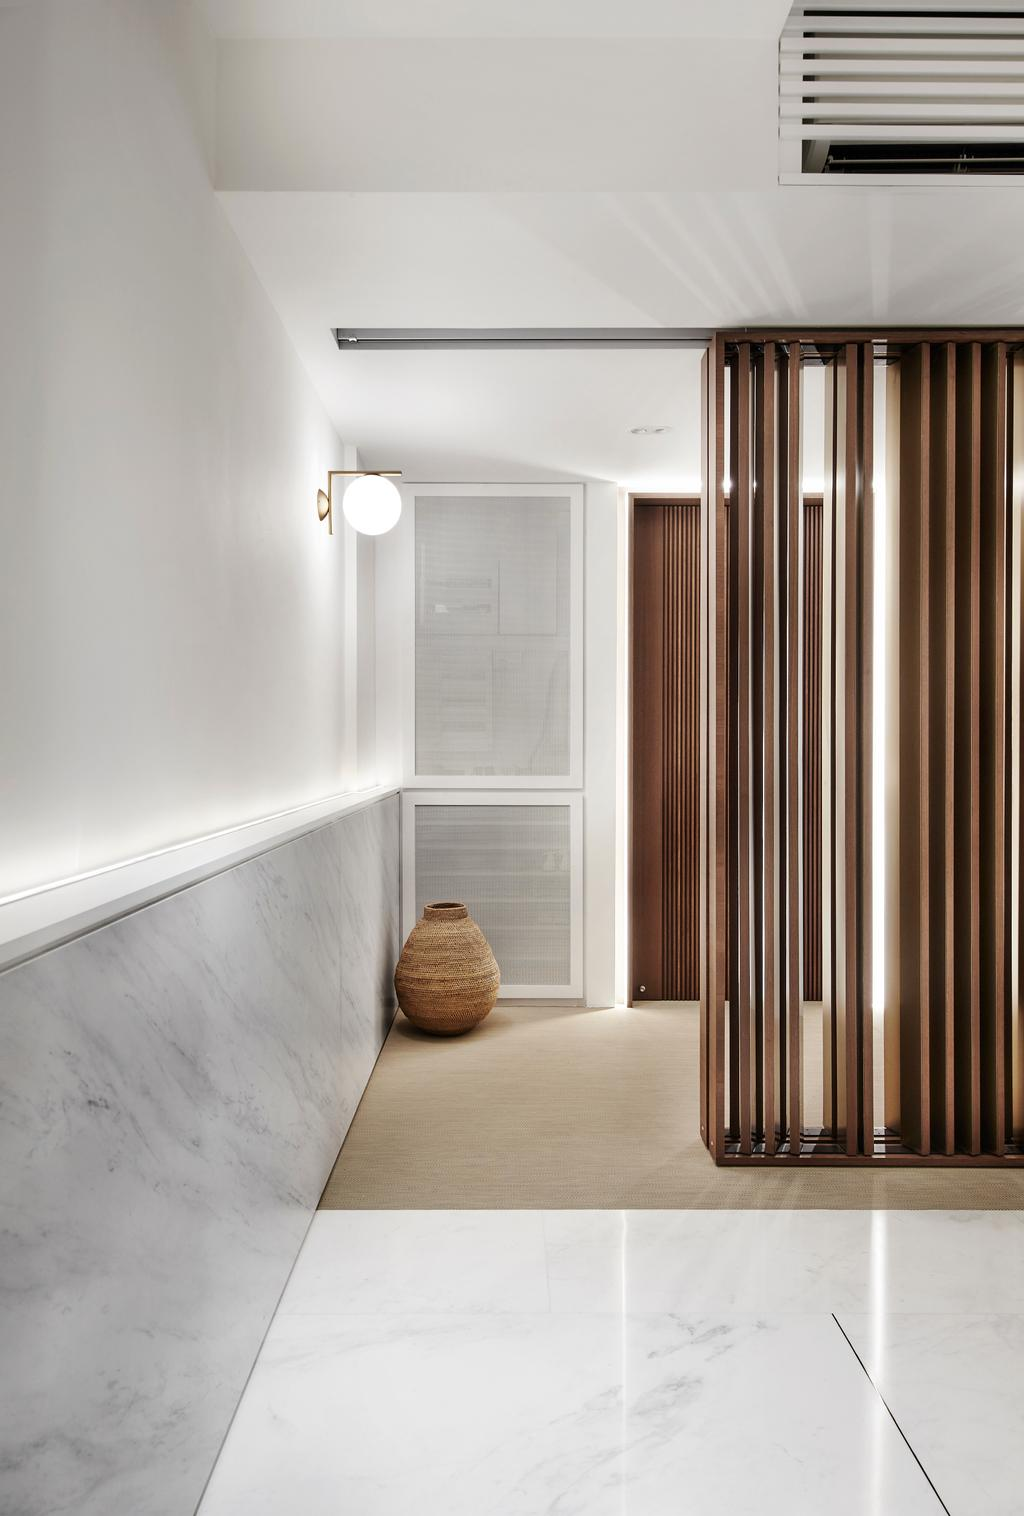 Contemporary, Condo, The Seafront, Architect, UPSTAIRS_, Minimalistic, Jar, Pottery, Vase, Door, Folding Door, Indoors, Interior Design